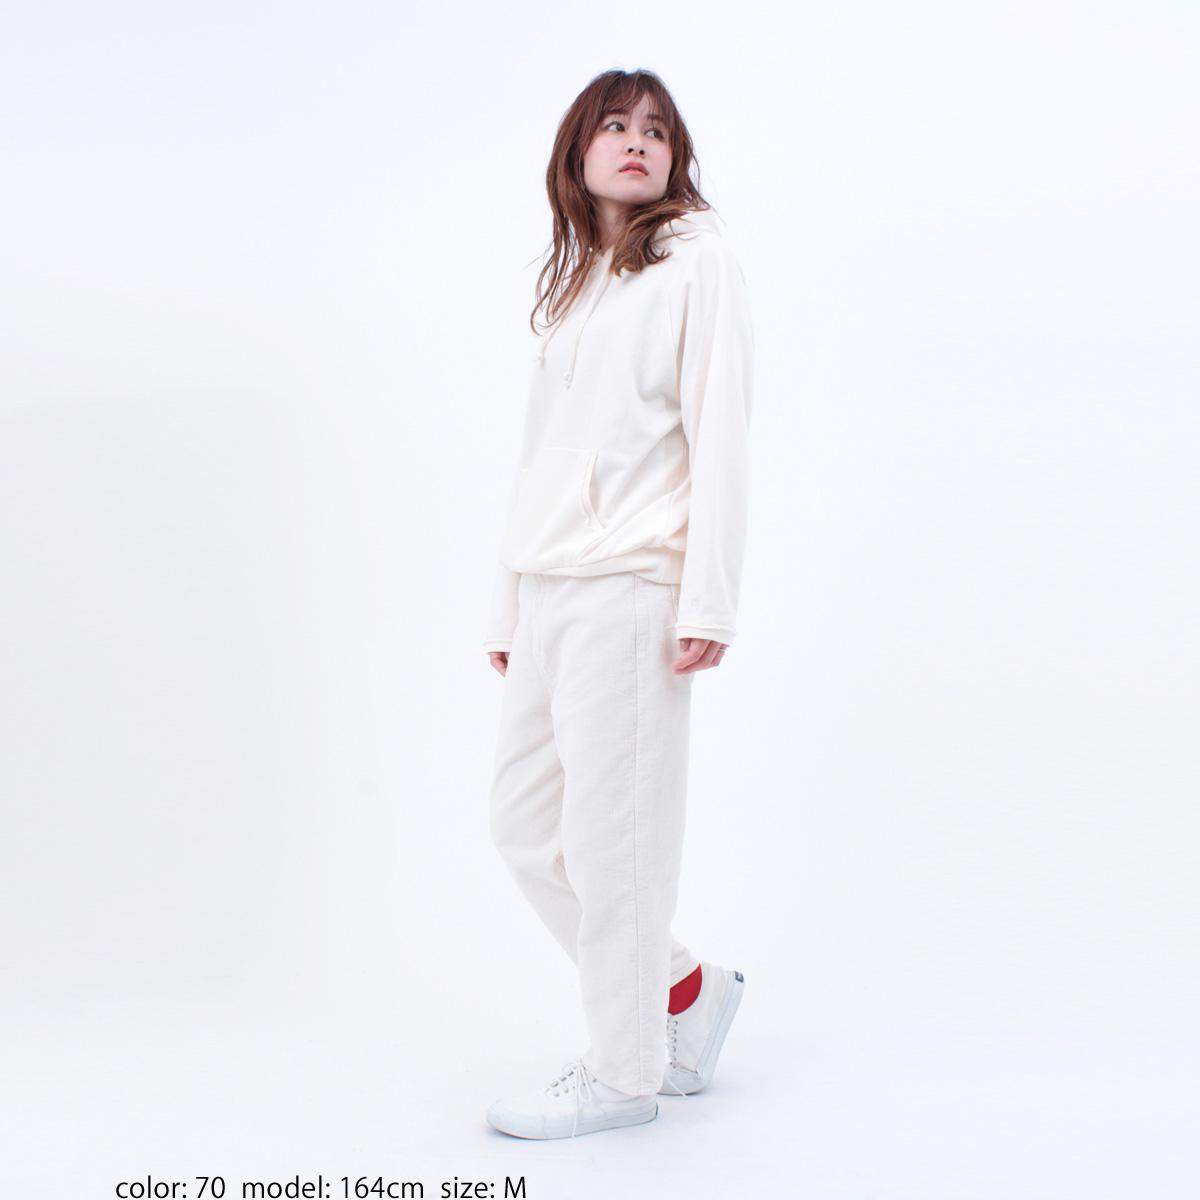 【SALE】Cafetty ■暖■ コーデュロイネオテーパード CF0336